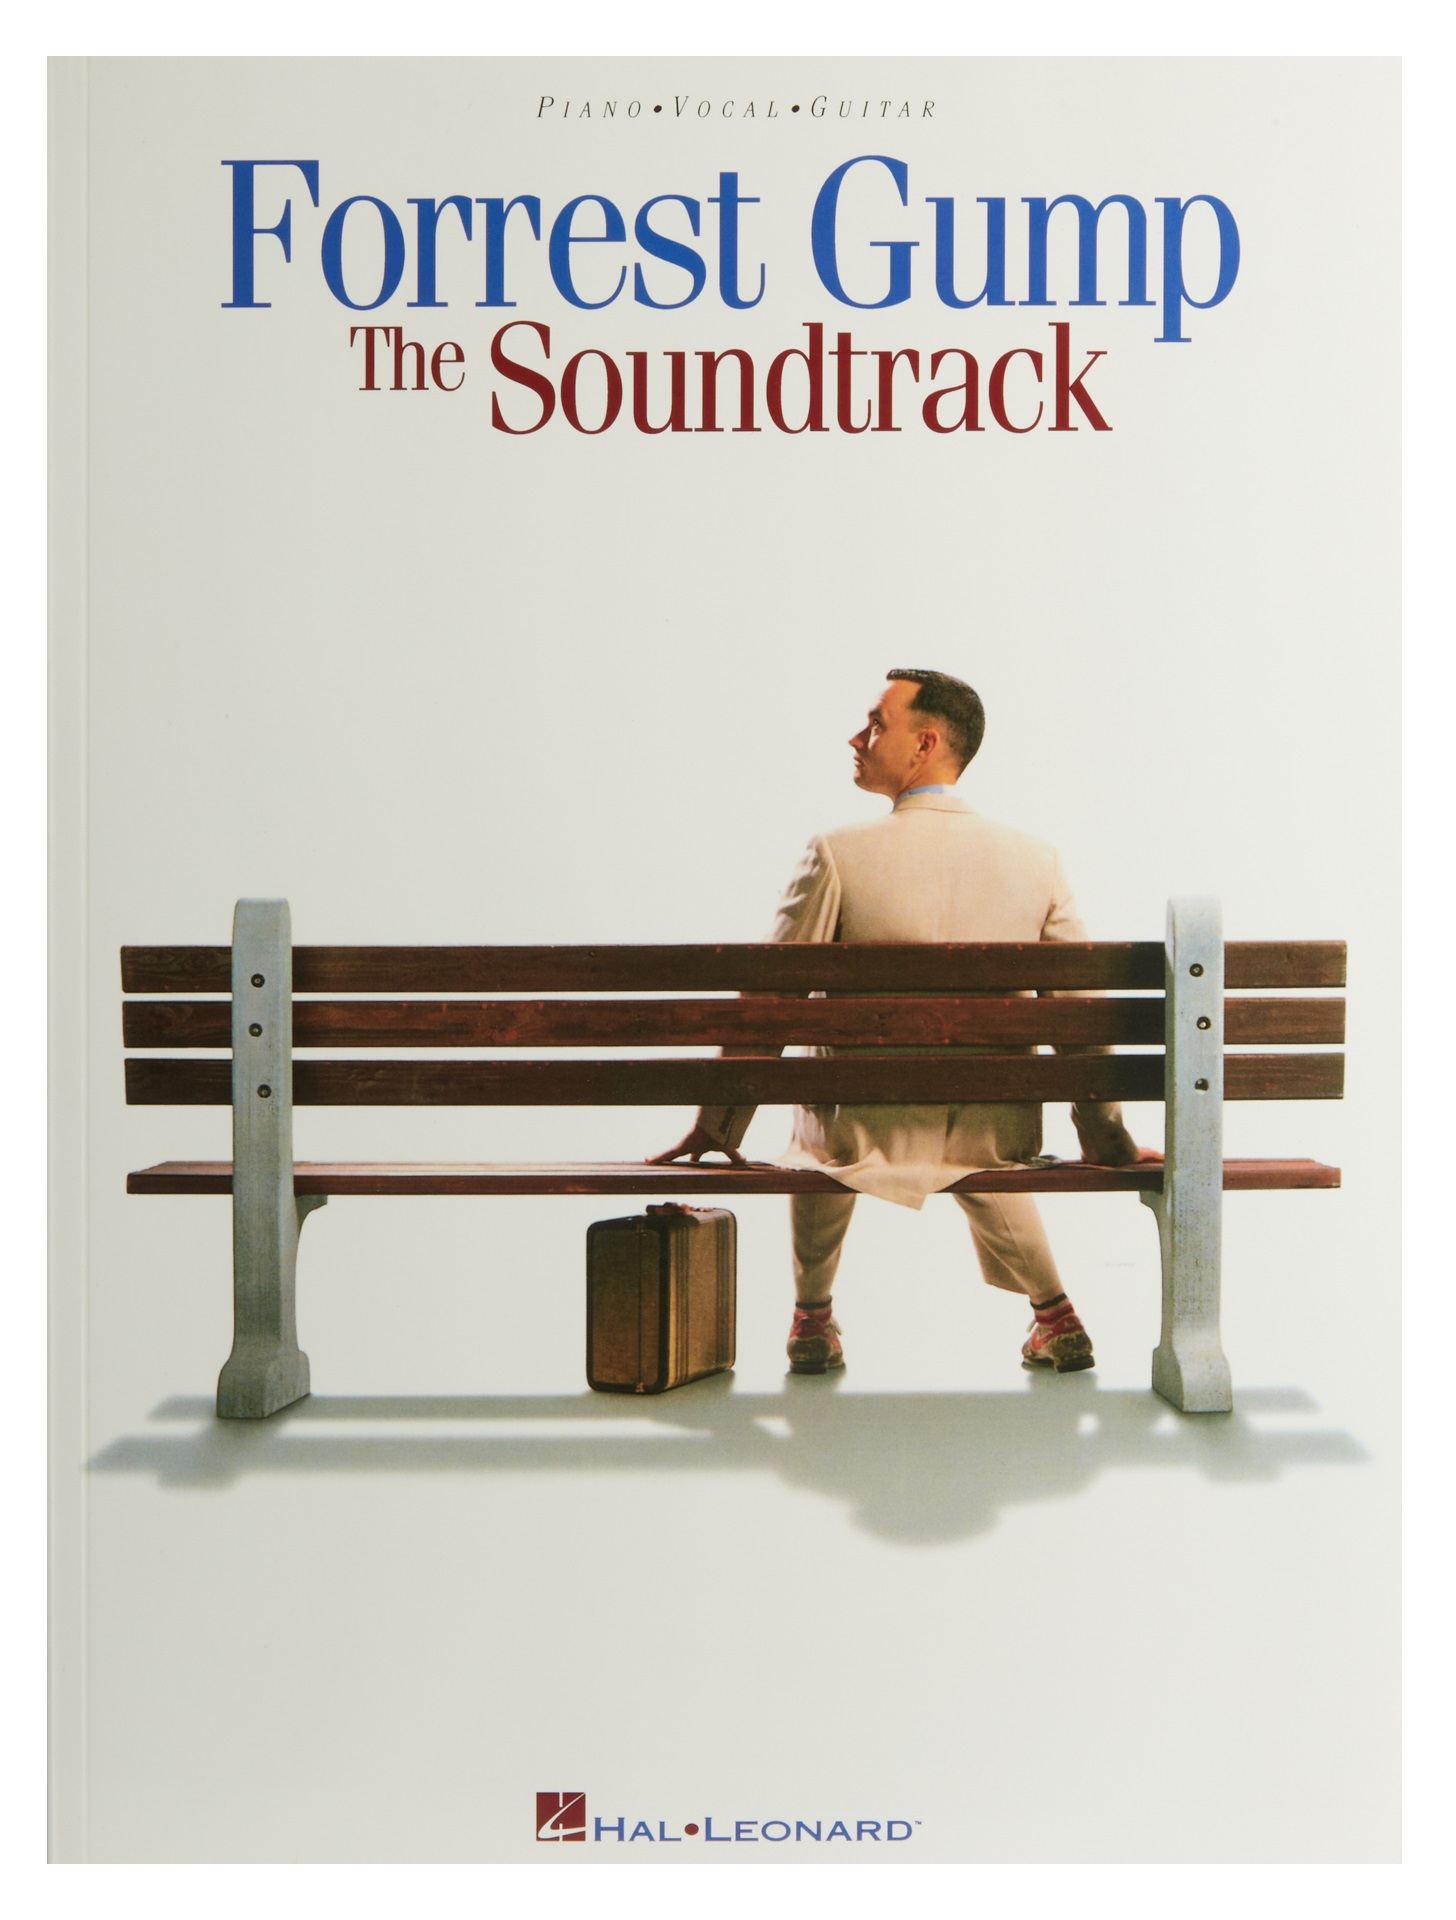 MS Forrest Gump: The Soundtrack